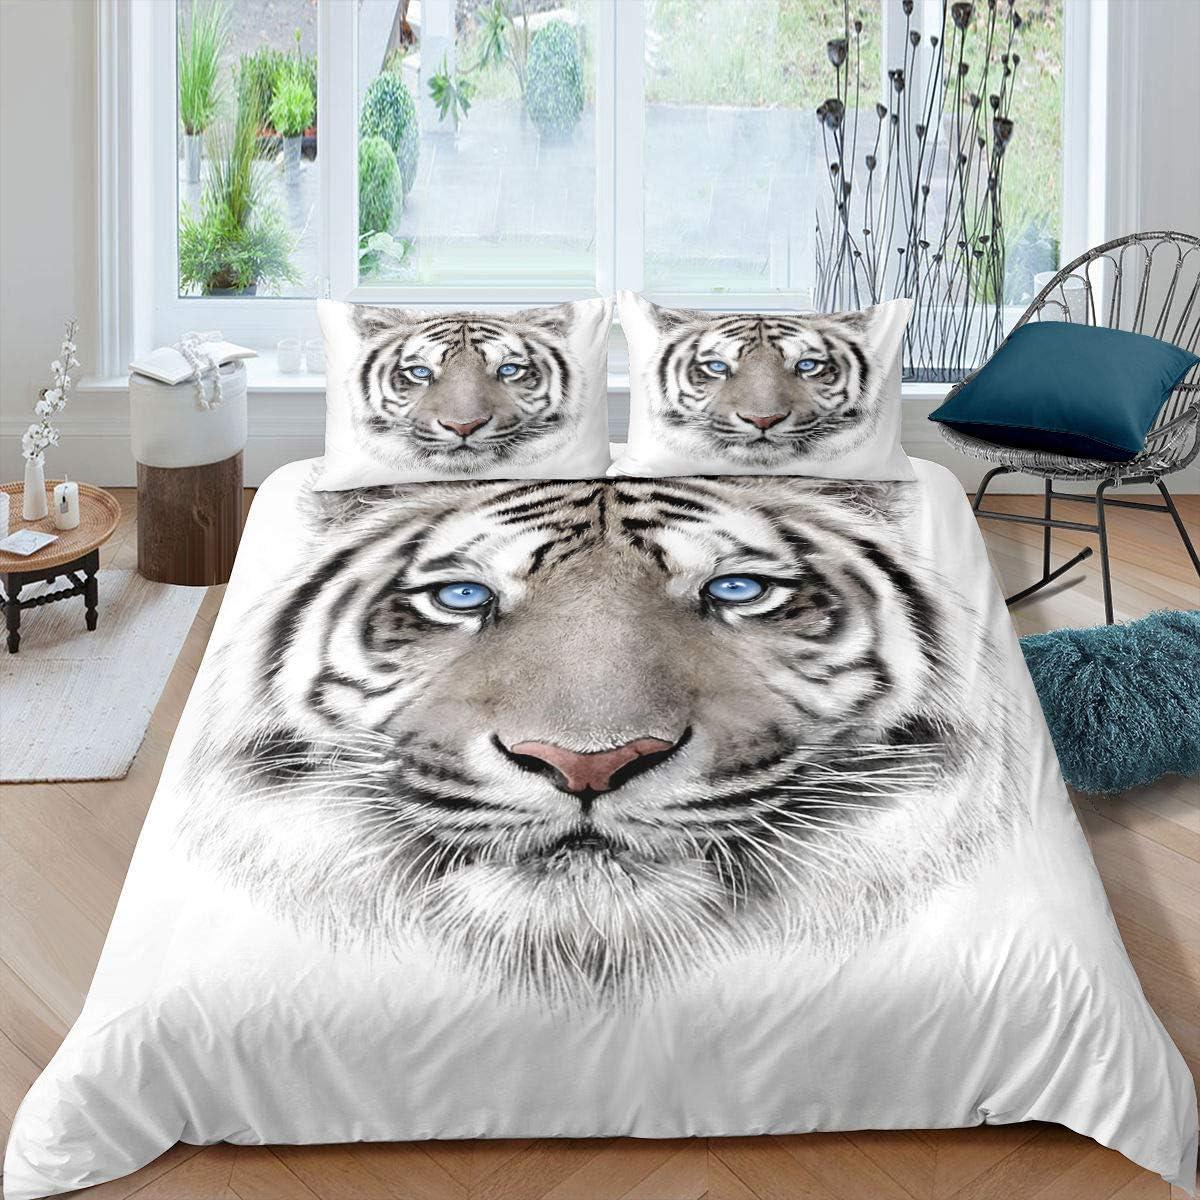 Erosebridal Kids Tiger Comforter Cover Wild Super beauty product restock quality top Brand Cheap Sale Venue Bedding Print Animal